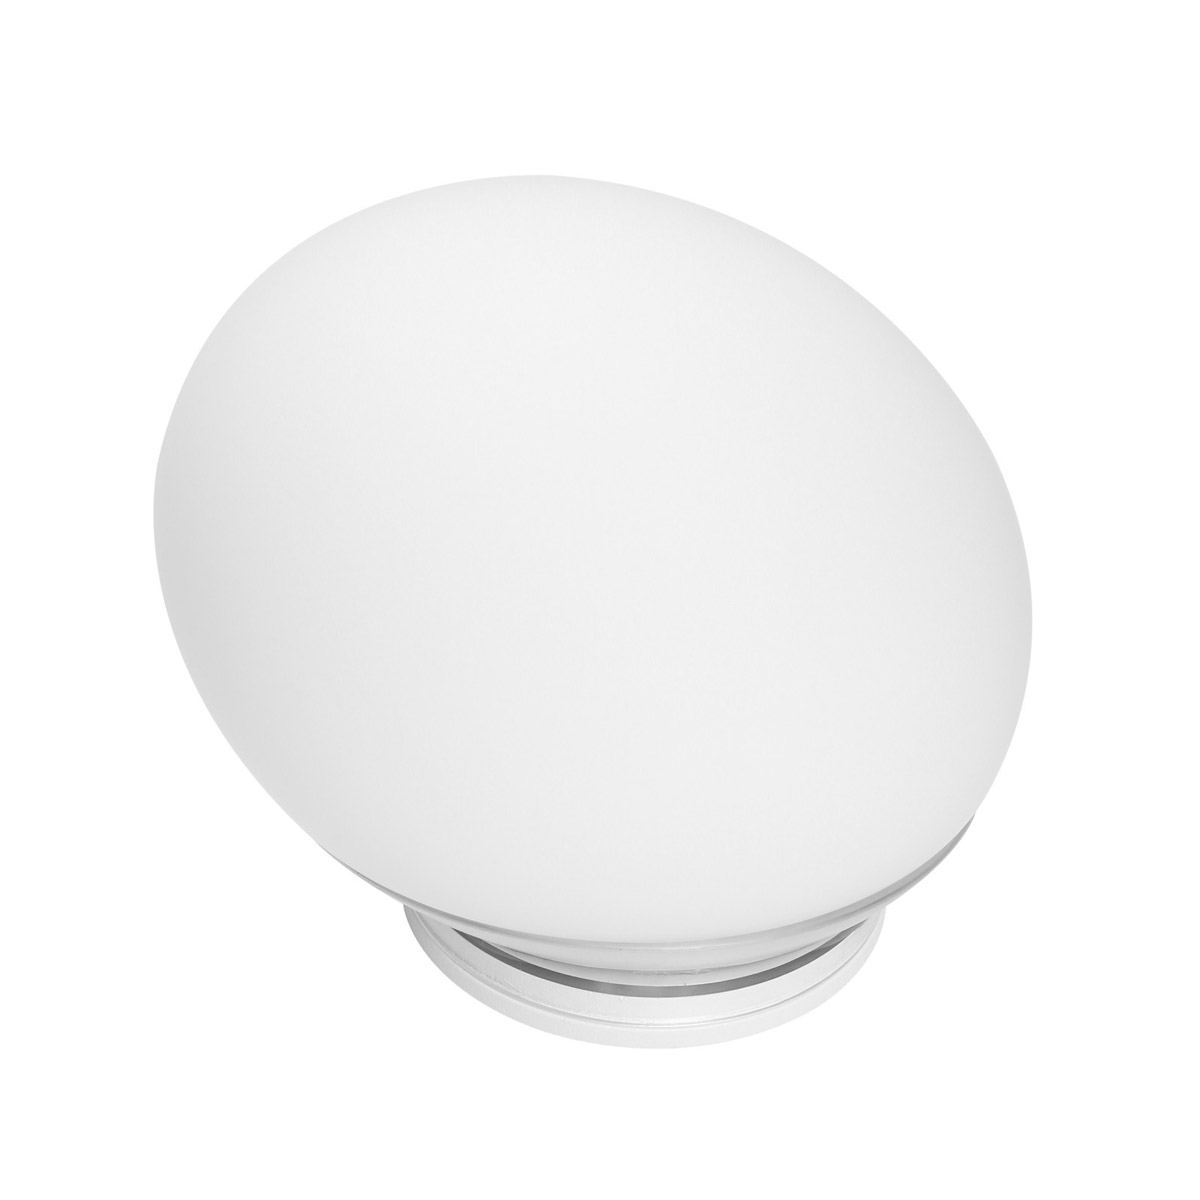 Linea Light LED Leseleuchte Goccia Lum LED 4W V Soff B Co, Weiß, Glas, 7243 | Lampen > Tischleuchten > Leseleuchten | Weiß | Glas